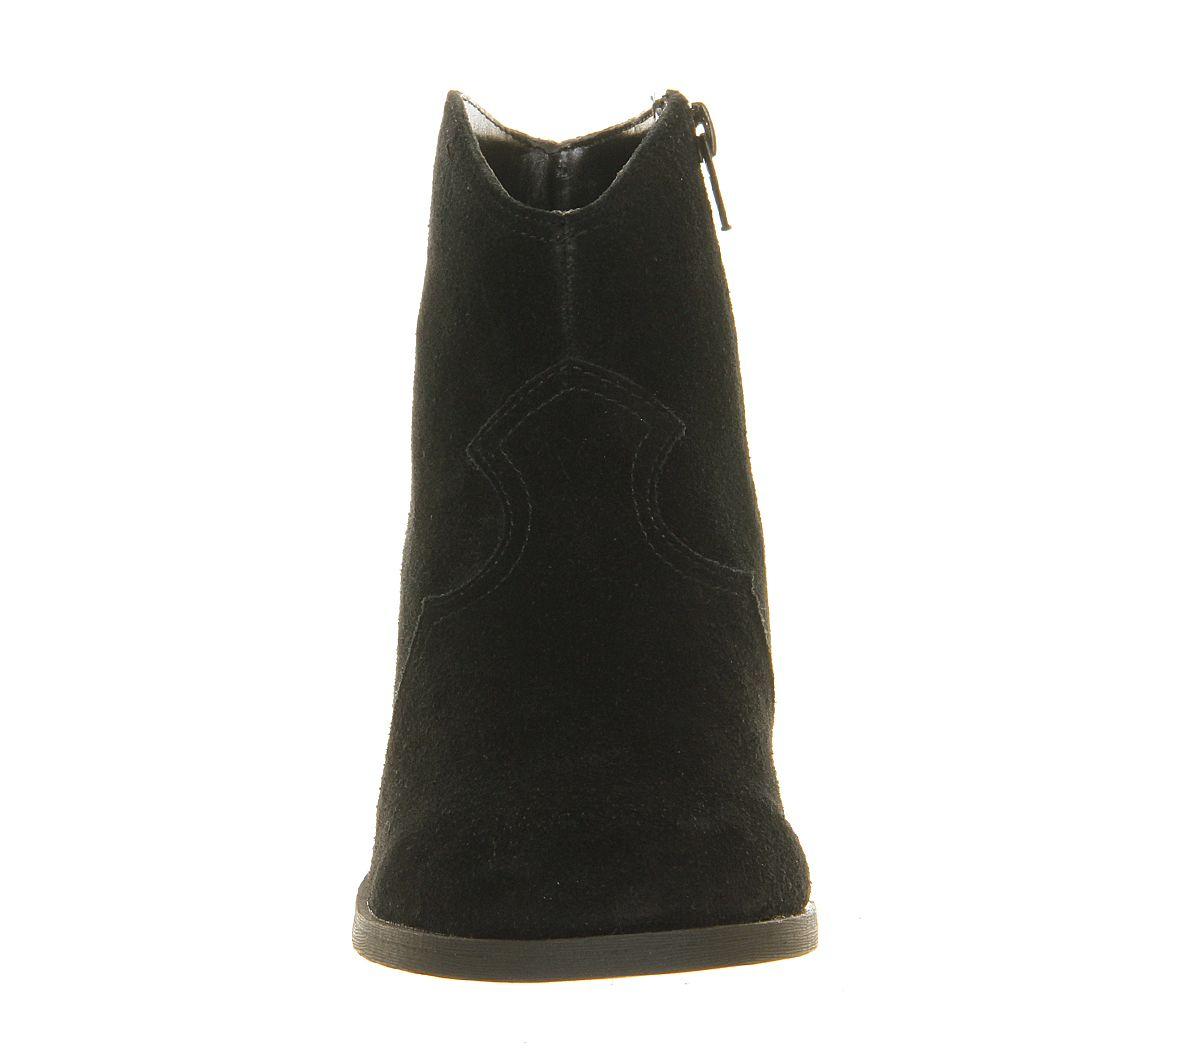 Office Courtney Suede Western Boot in Black Suede (Black)